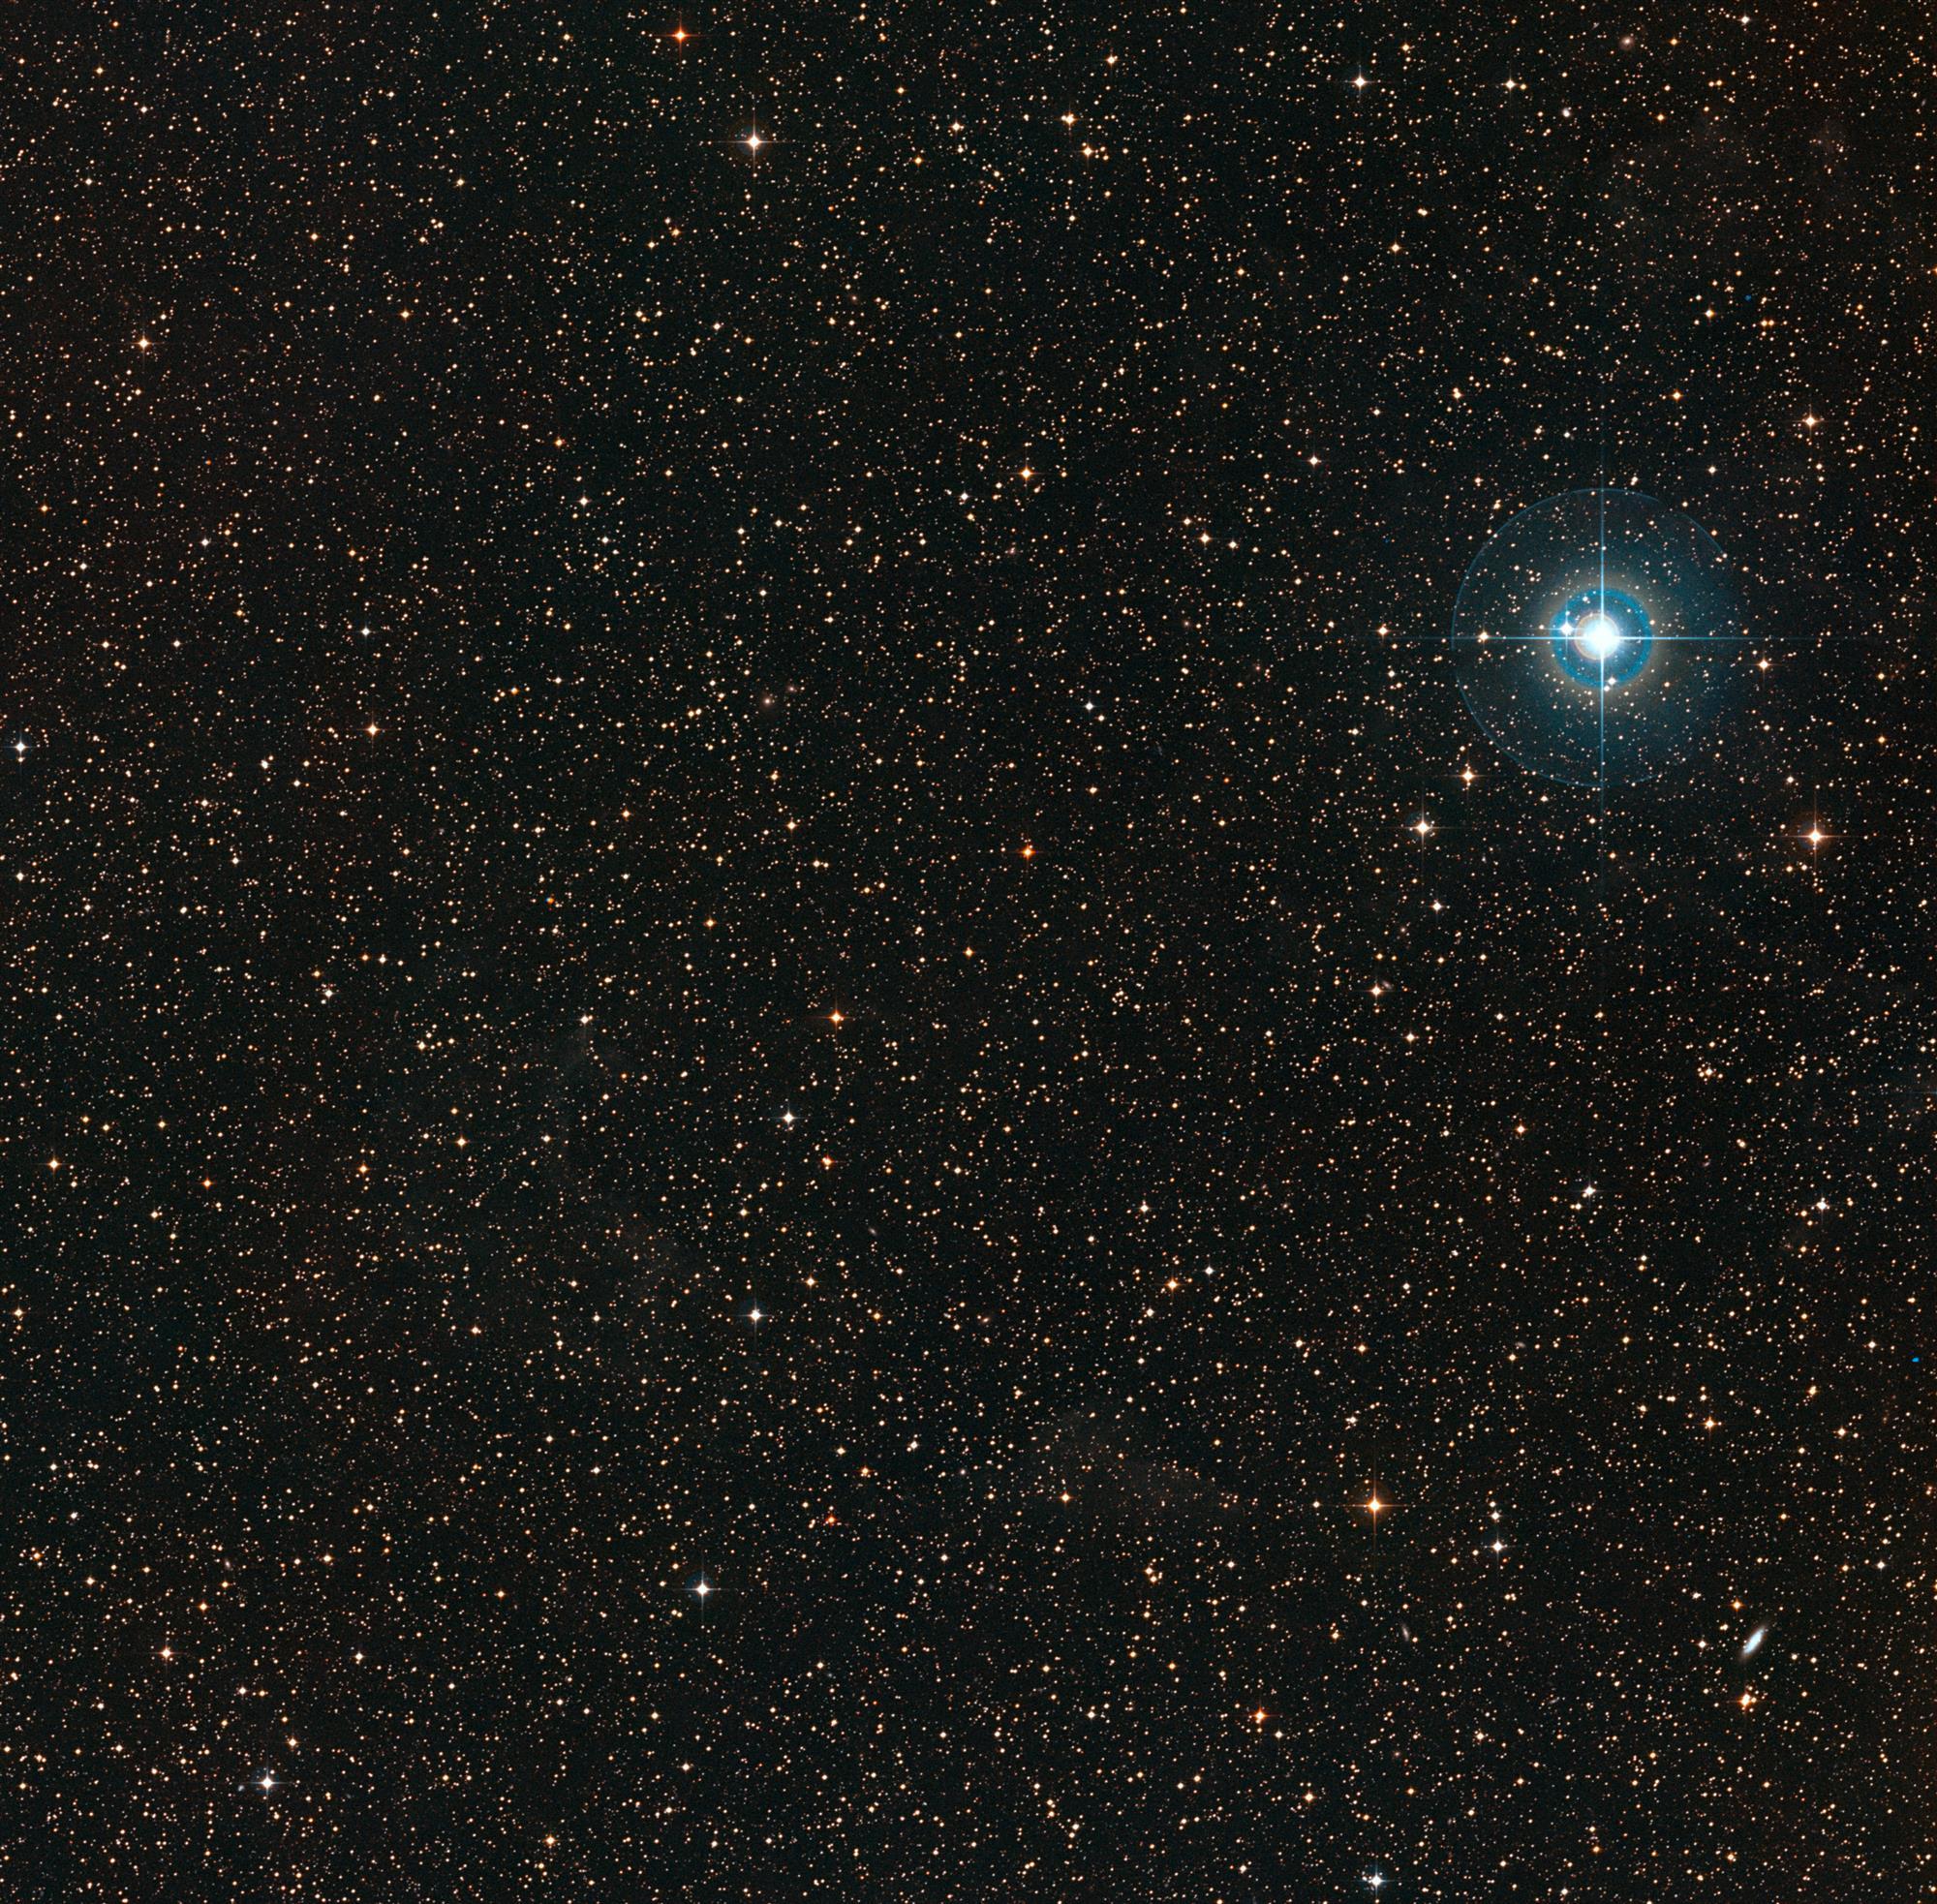 planeta2. Estrella enana PDS 70